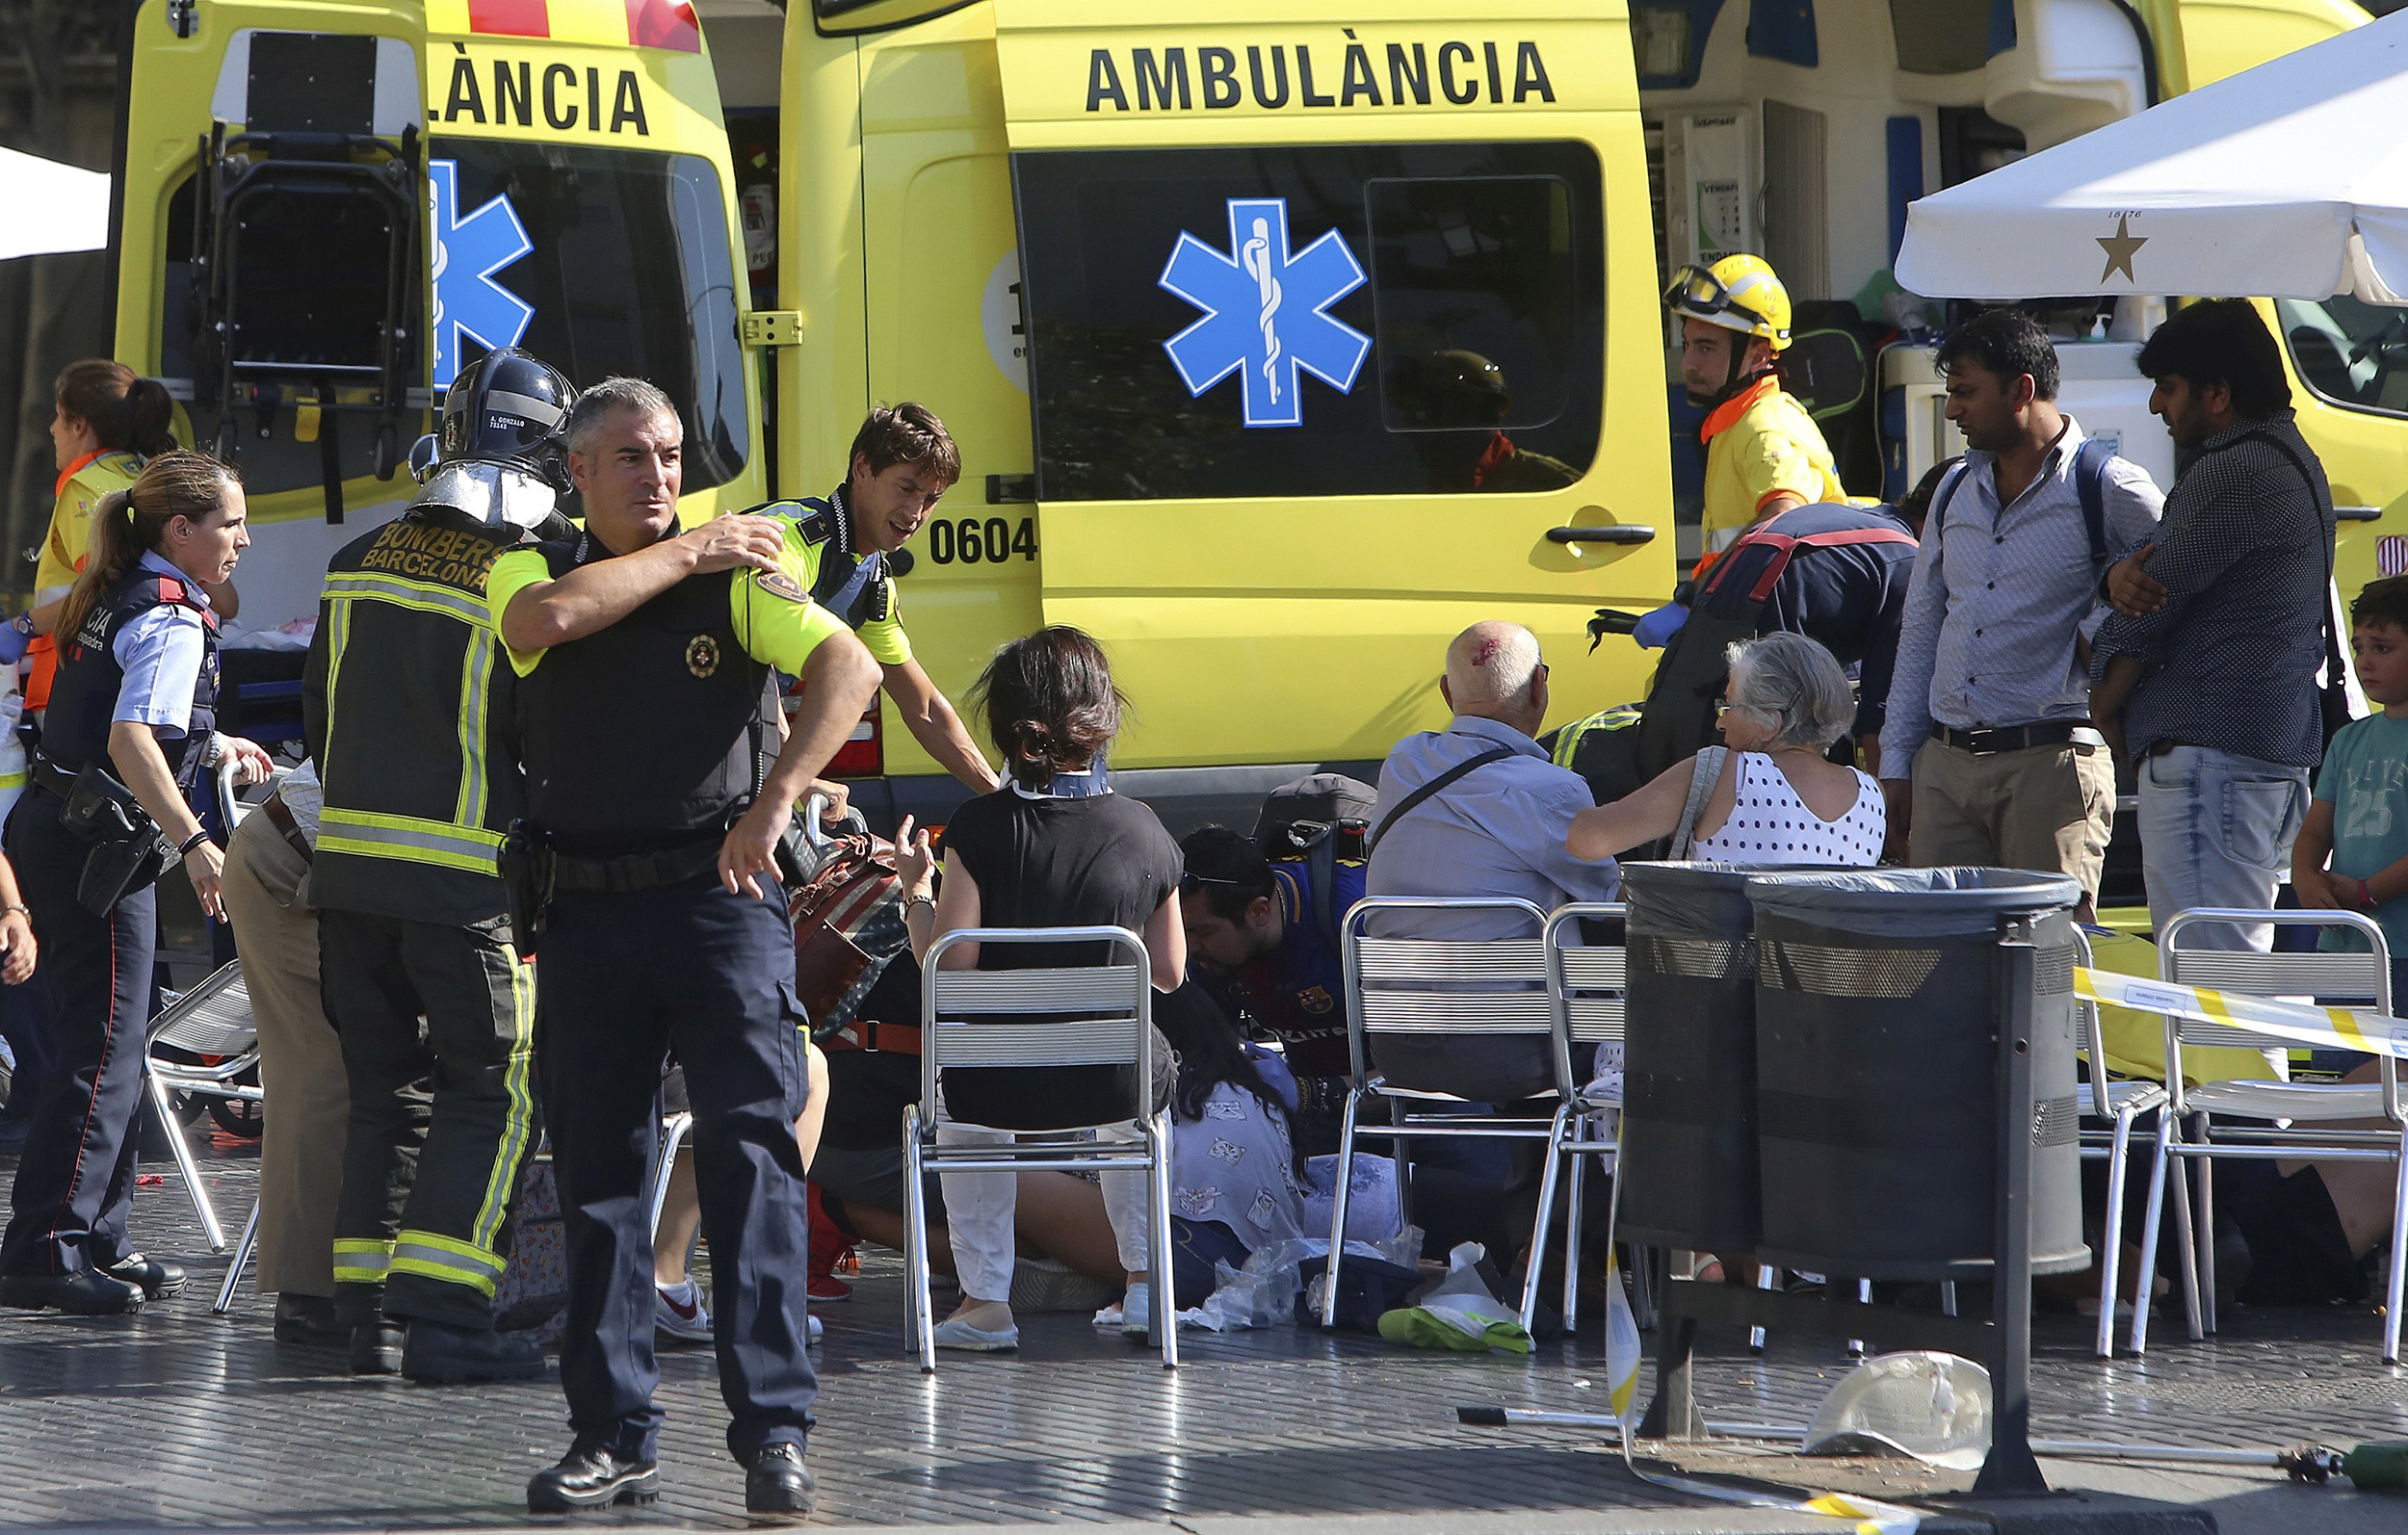 Spain No Stranger to Terrorist Attacks